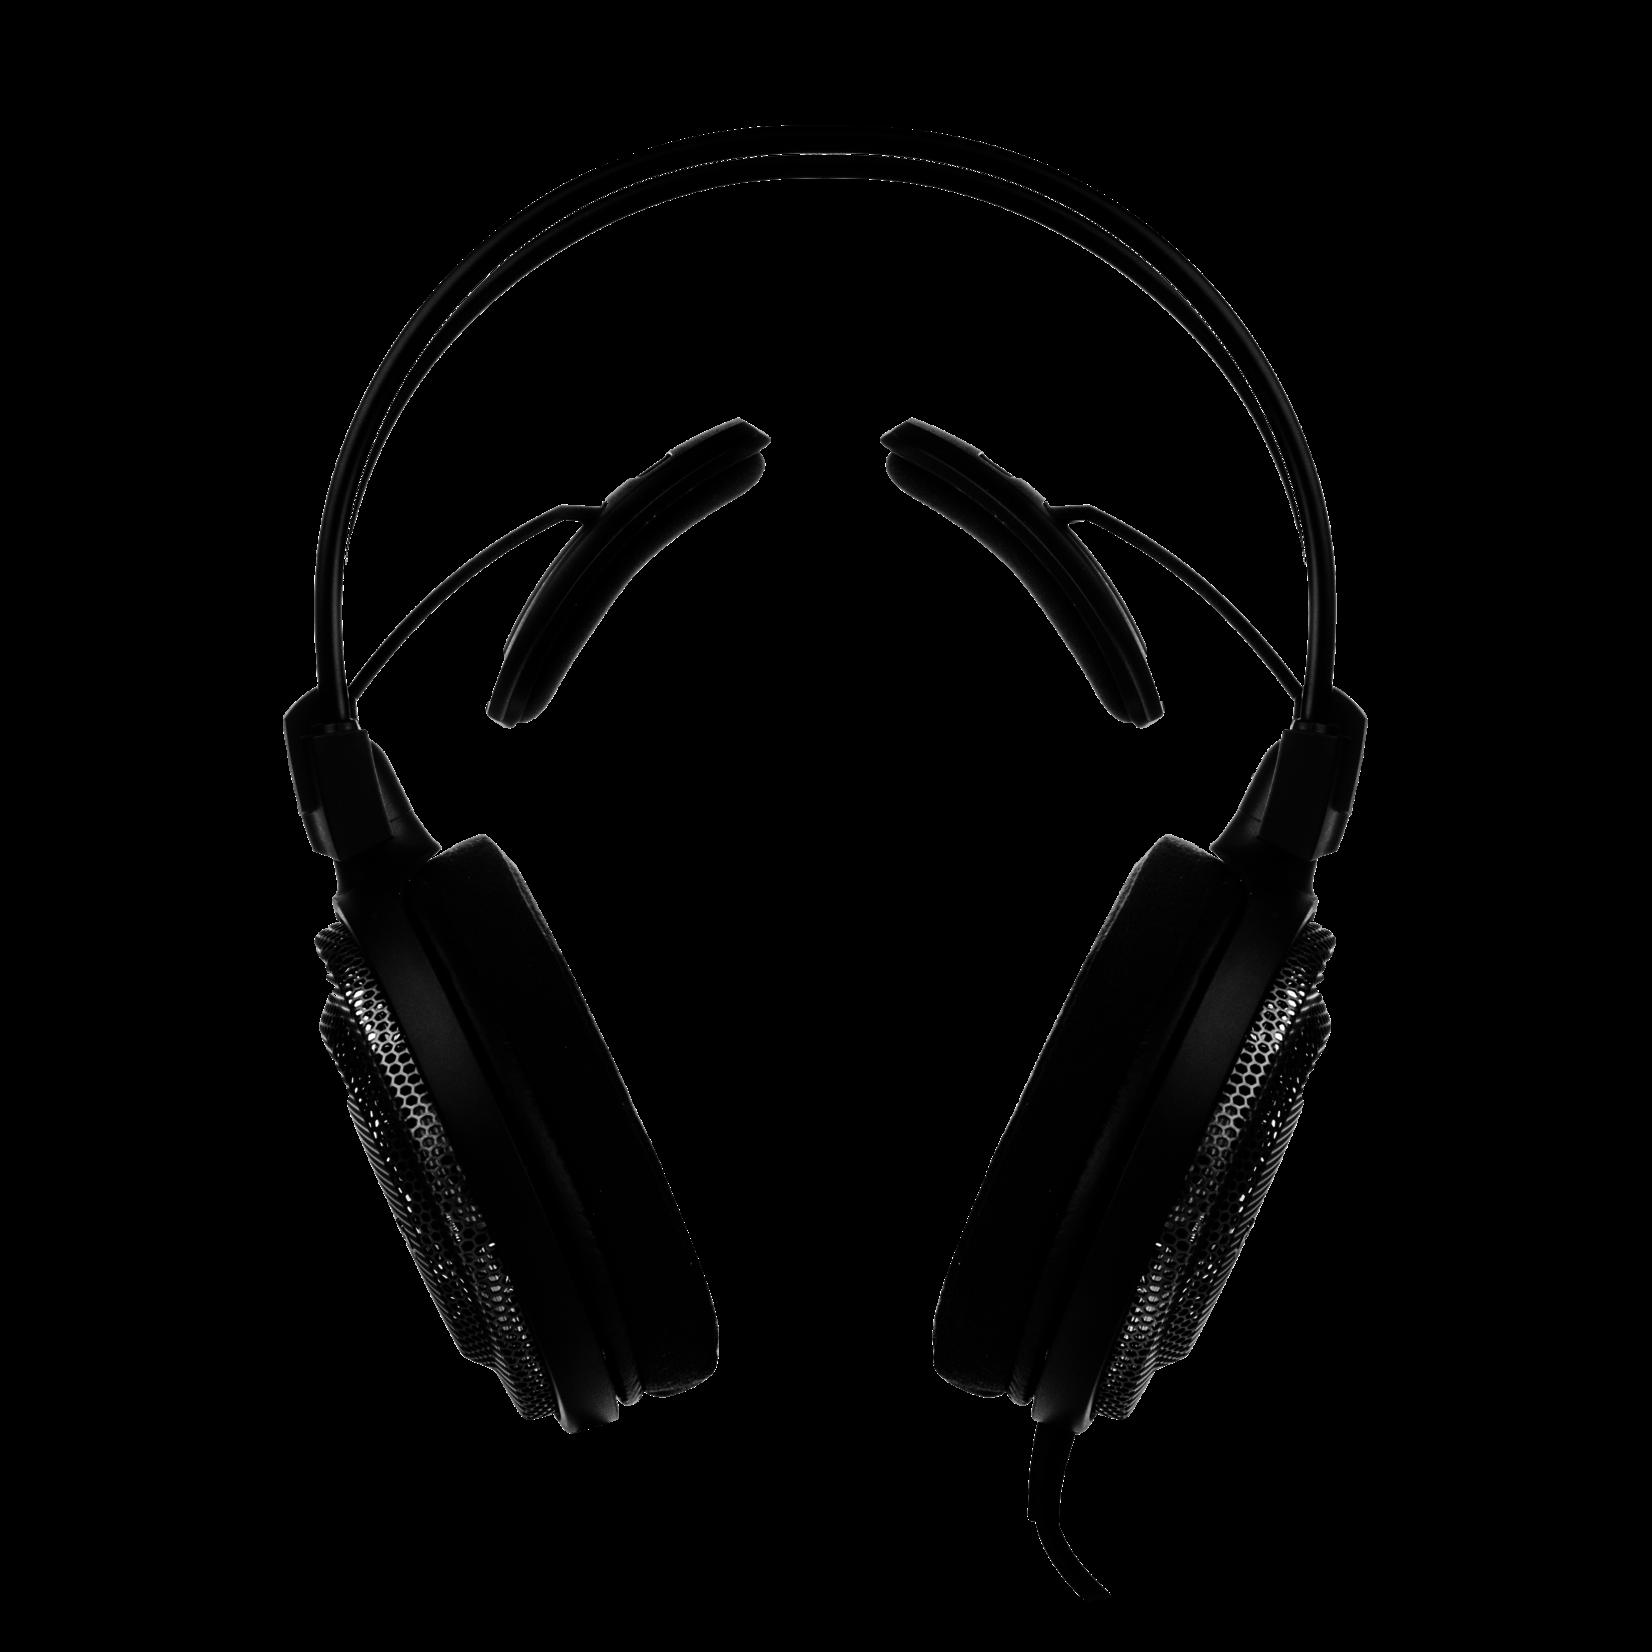 AUDIO-TECHNICA ATH-AD700X OPEN-AIR DYNAMIC HEADPHONES